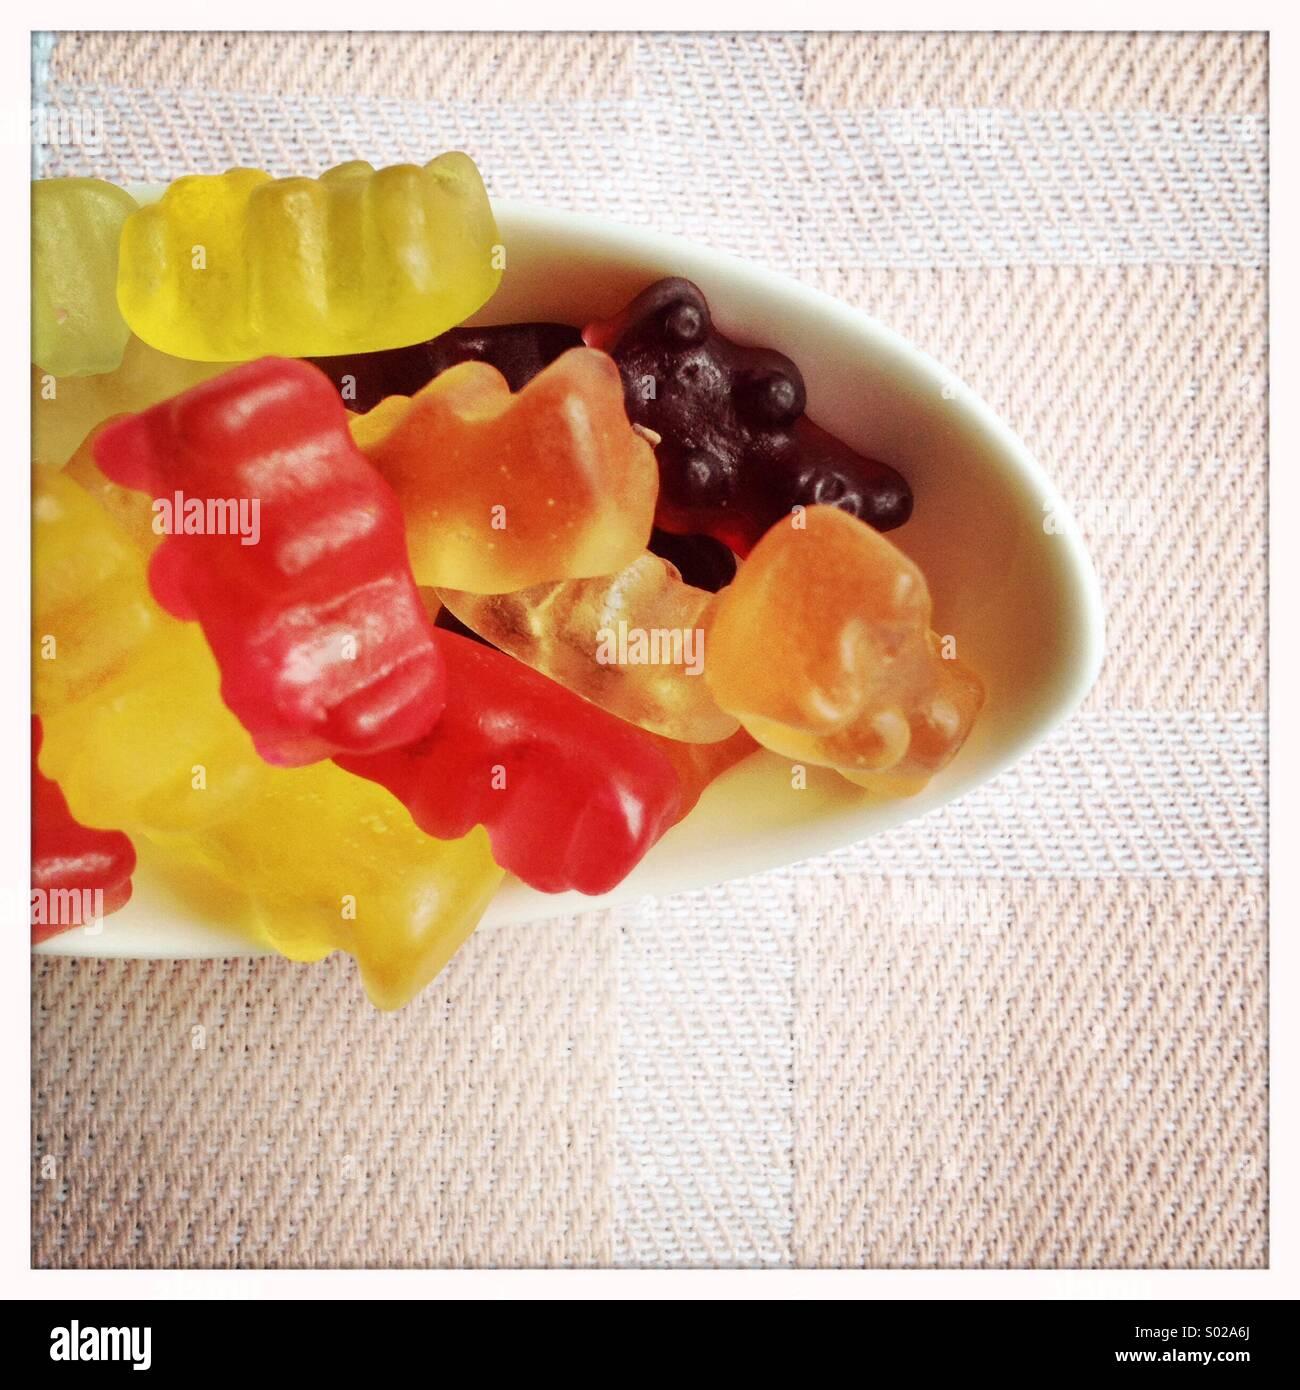 Gummy Bears - Stock Image